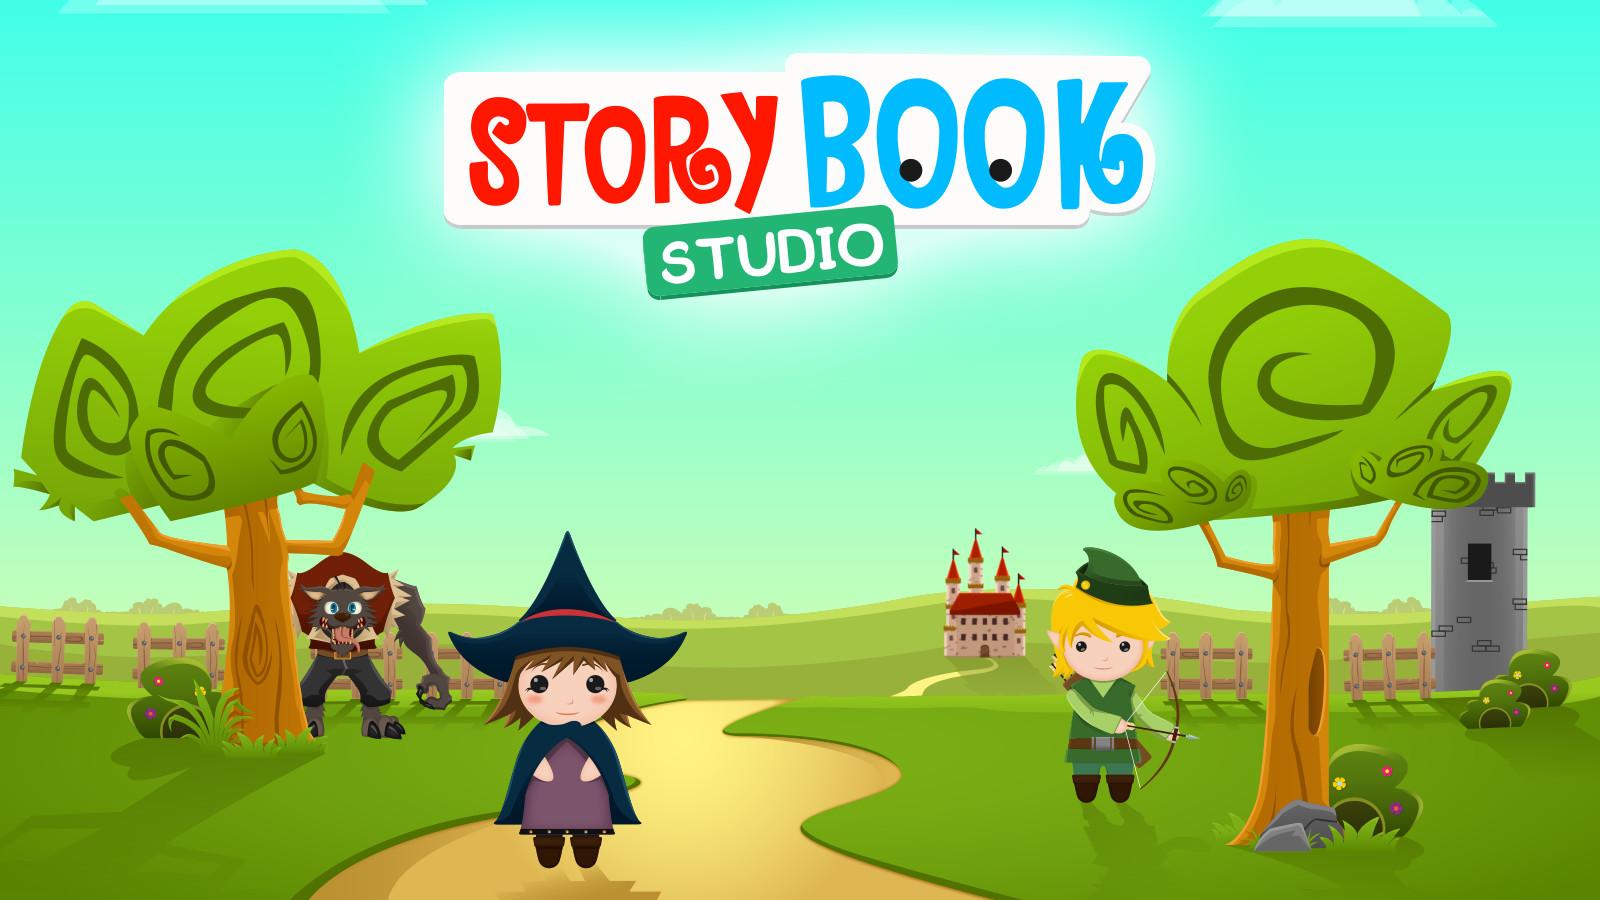 StoryBook Studio